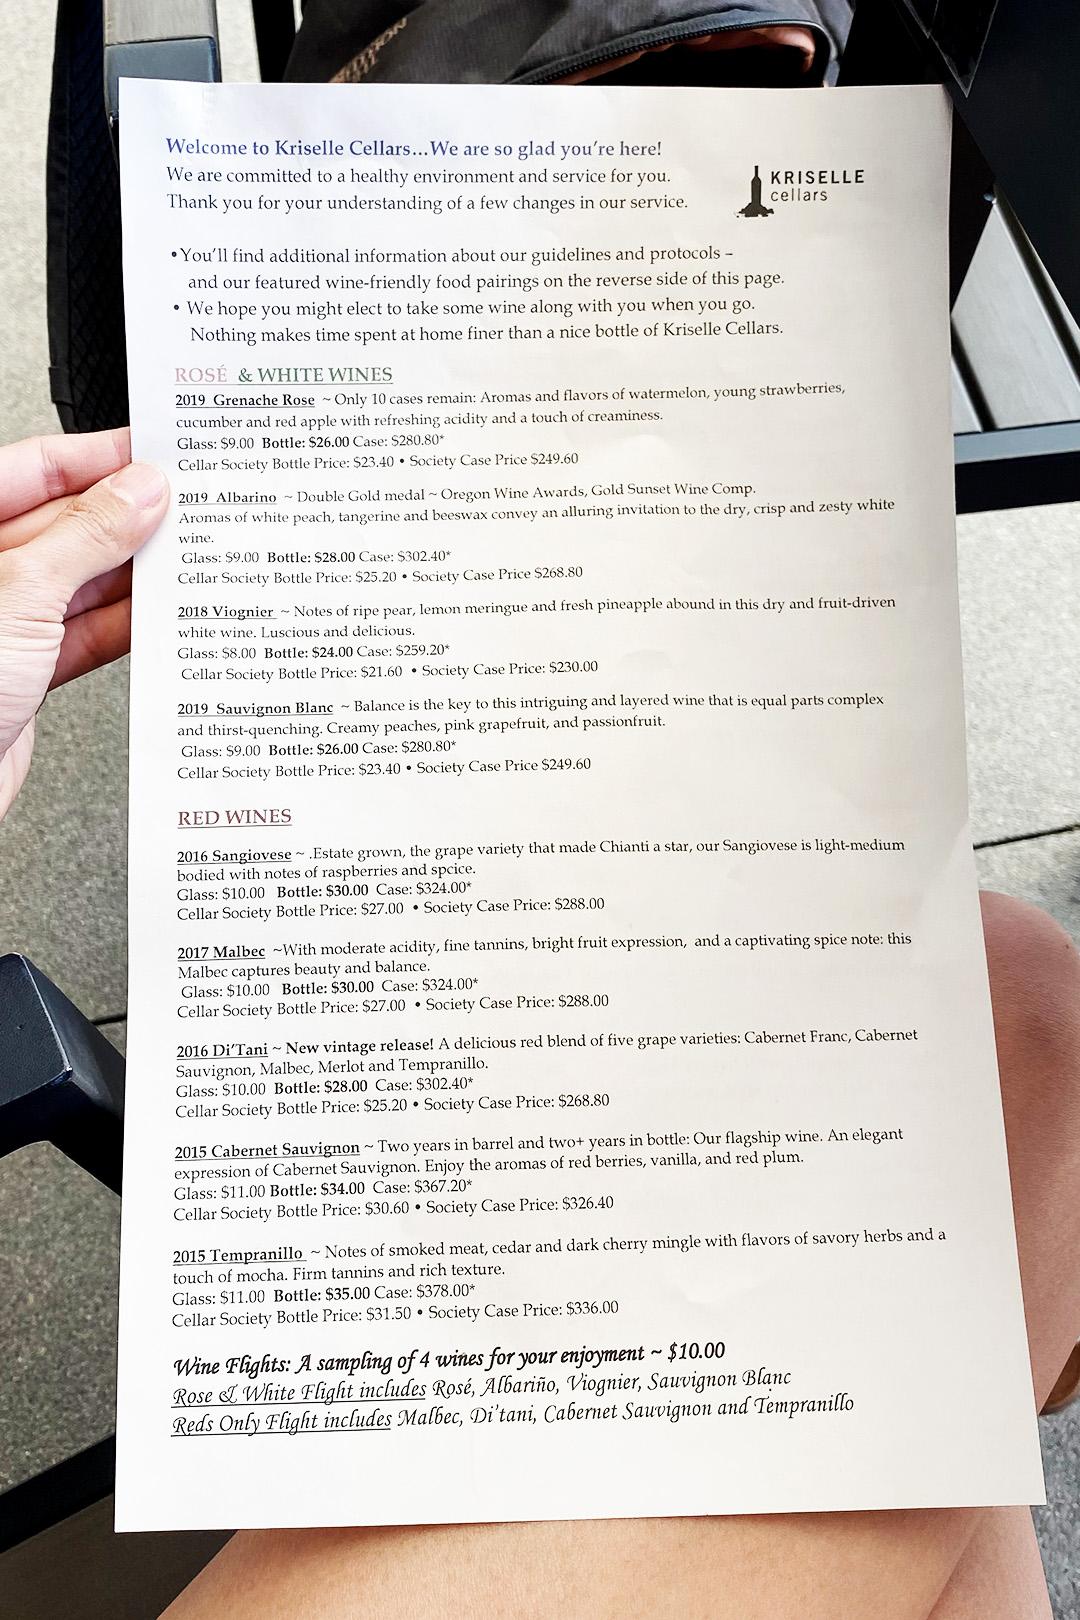 Kriselle Cellars Free Wine Tasting with Alaska Airlines Menu